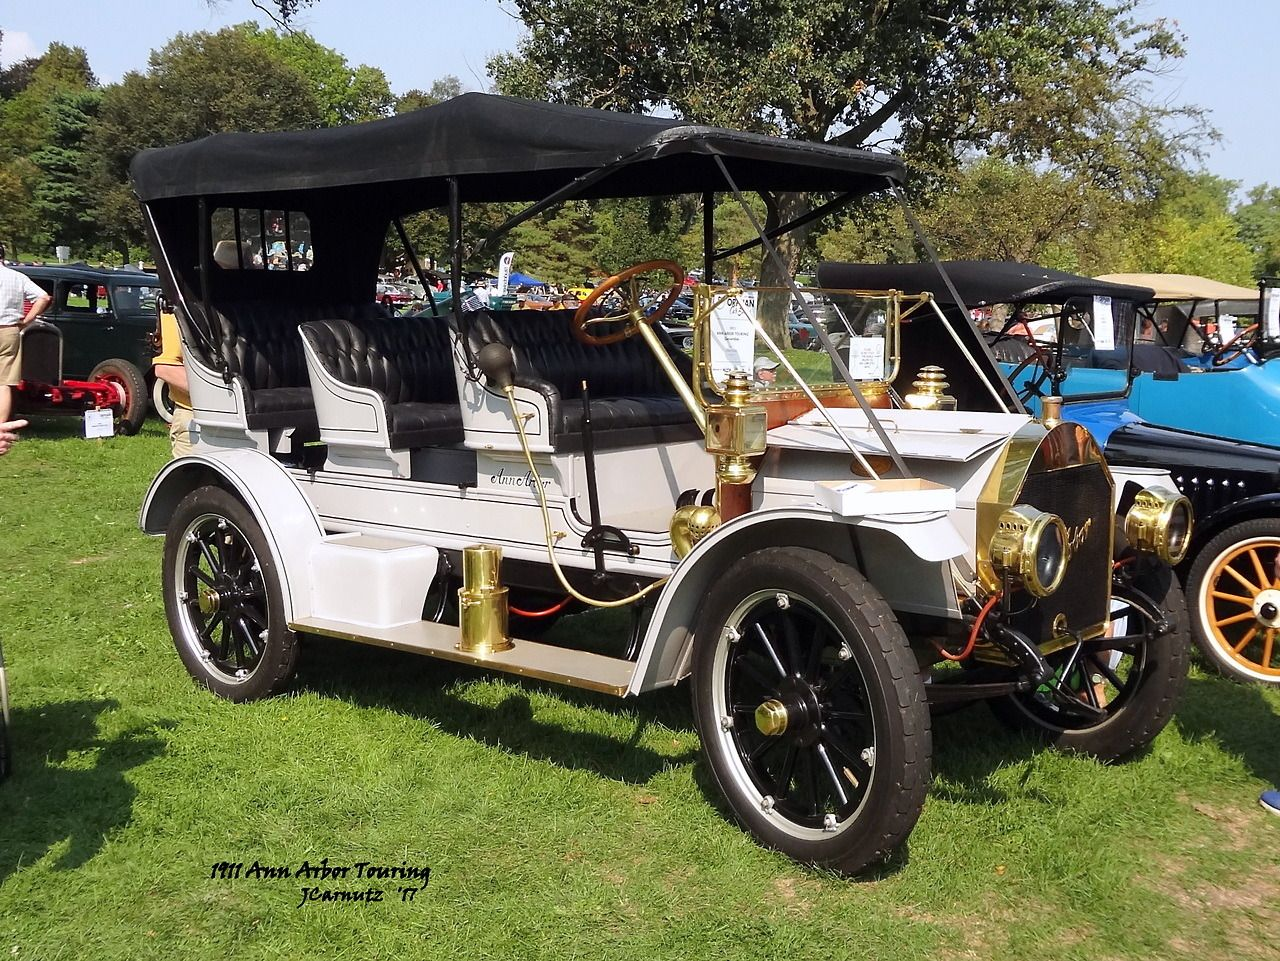 1911 Ann Arbor Touring The 2017 Orphan Car Show in Ypsilanti ...